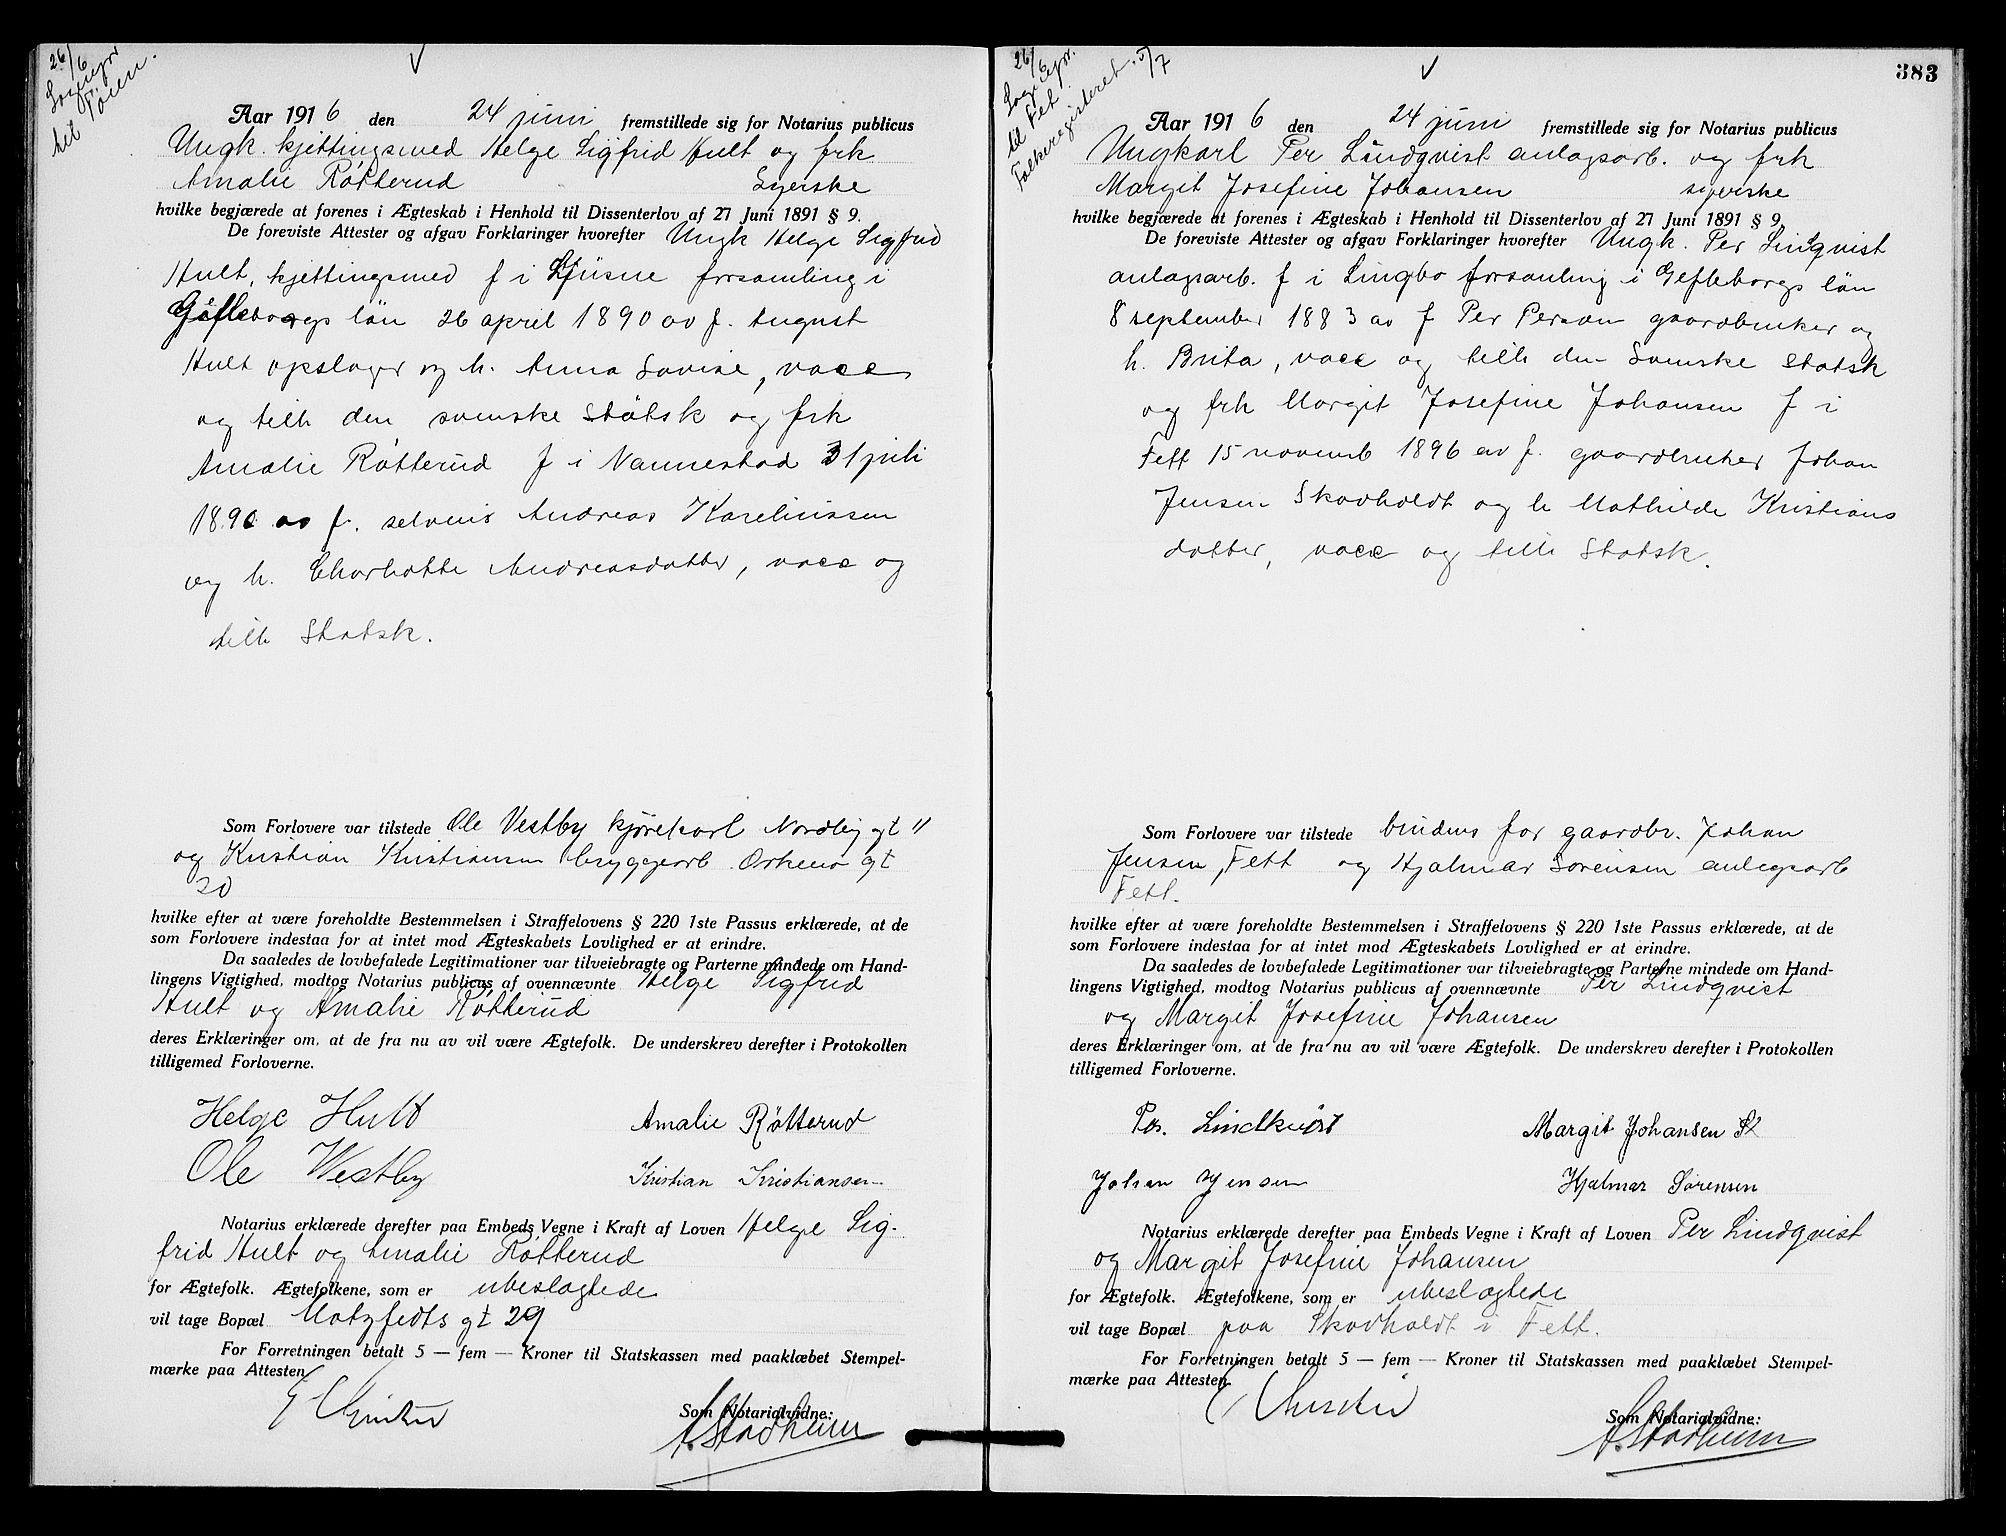 SAO, Oslo byfogd avd. I, L/Lb/Lbb/L0010: Notarialprotokoll, rekke II: Vigsler, 1914-1916, s. 482b-483a